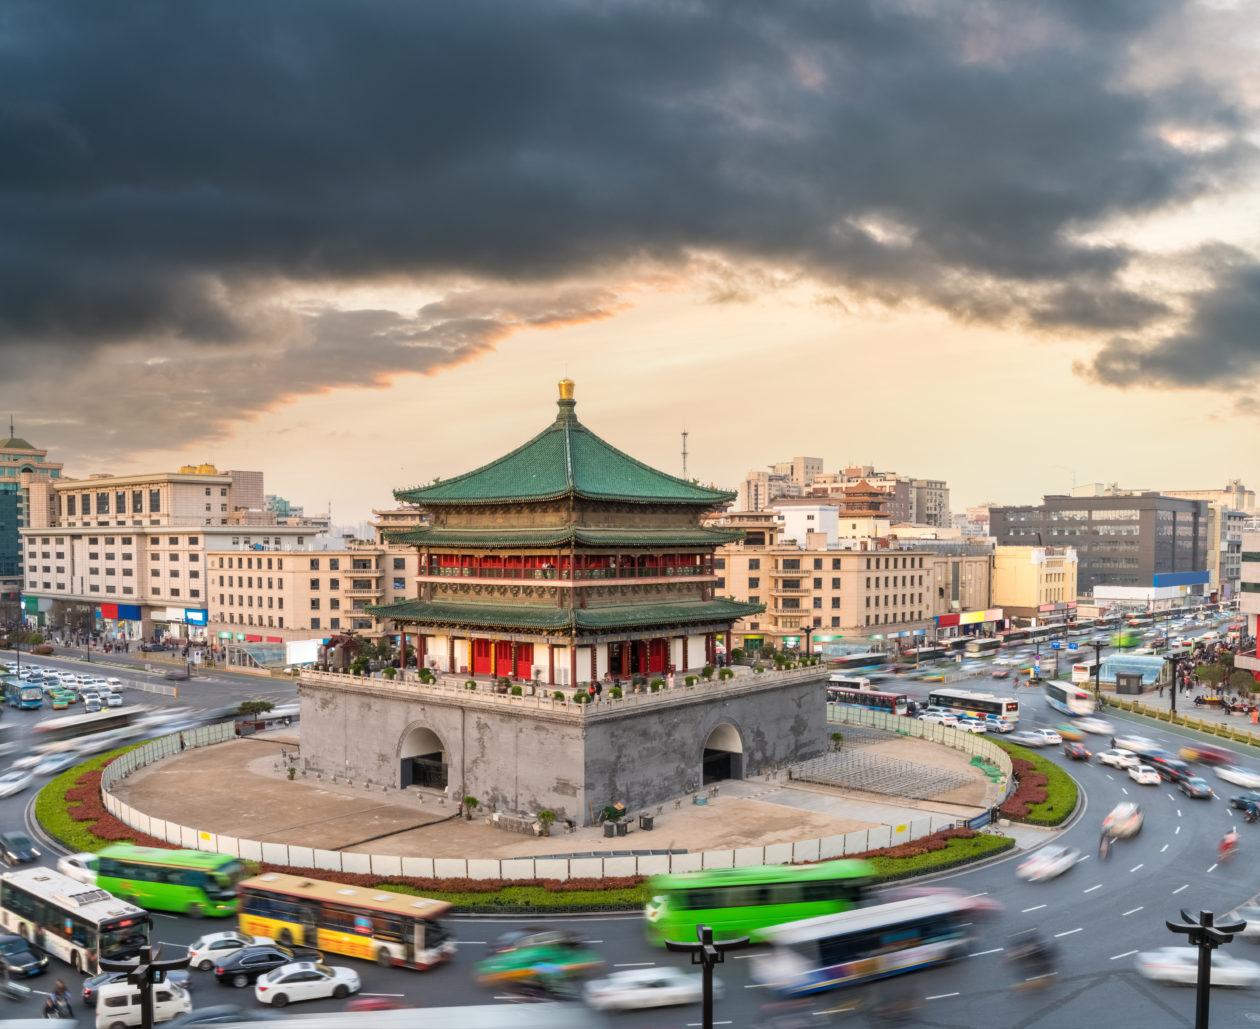 xi'an bell tower at dusk, Xi'an cabs pilot digital RMB as fare